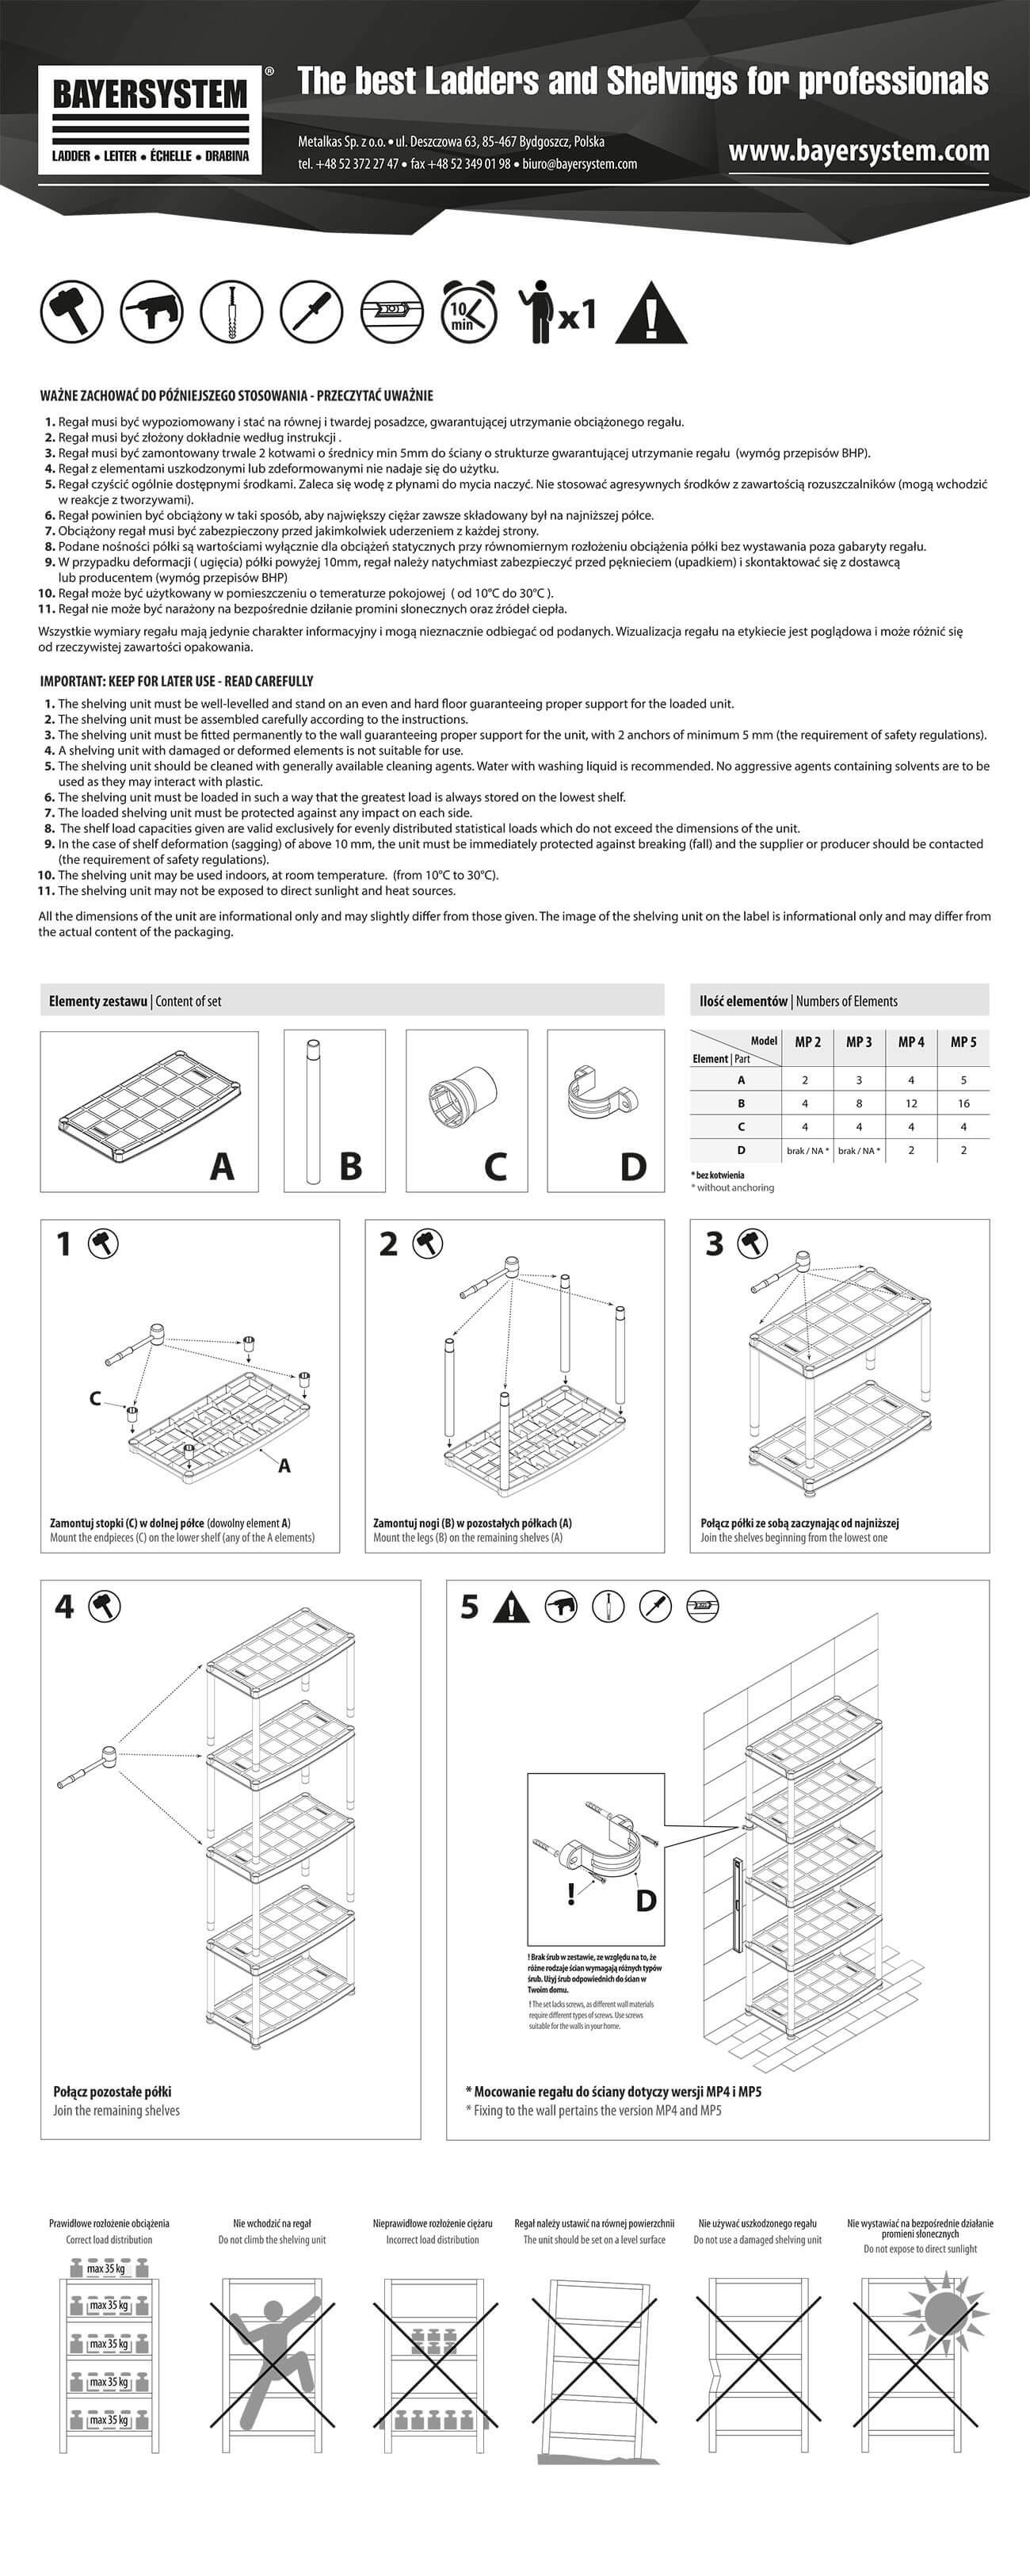 ulotka-regalu-medium-plast-instrukcja-montazu